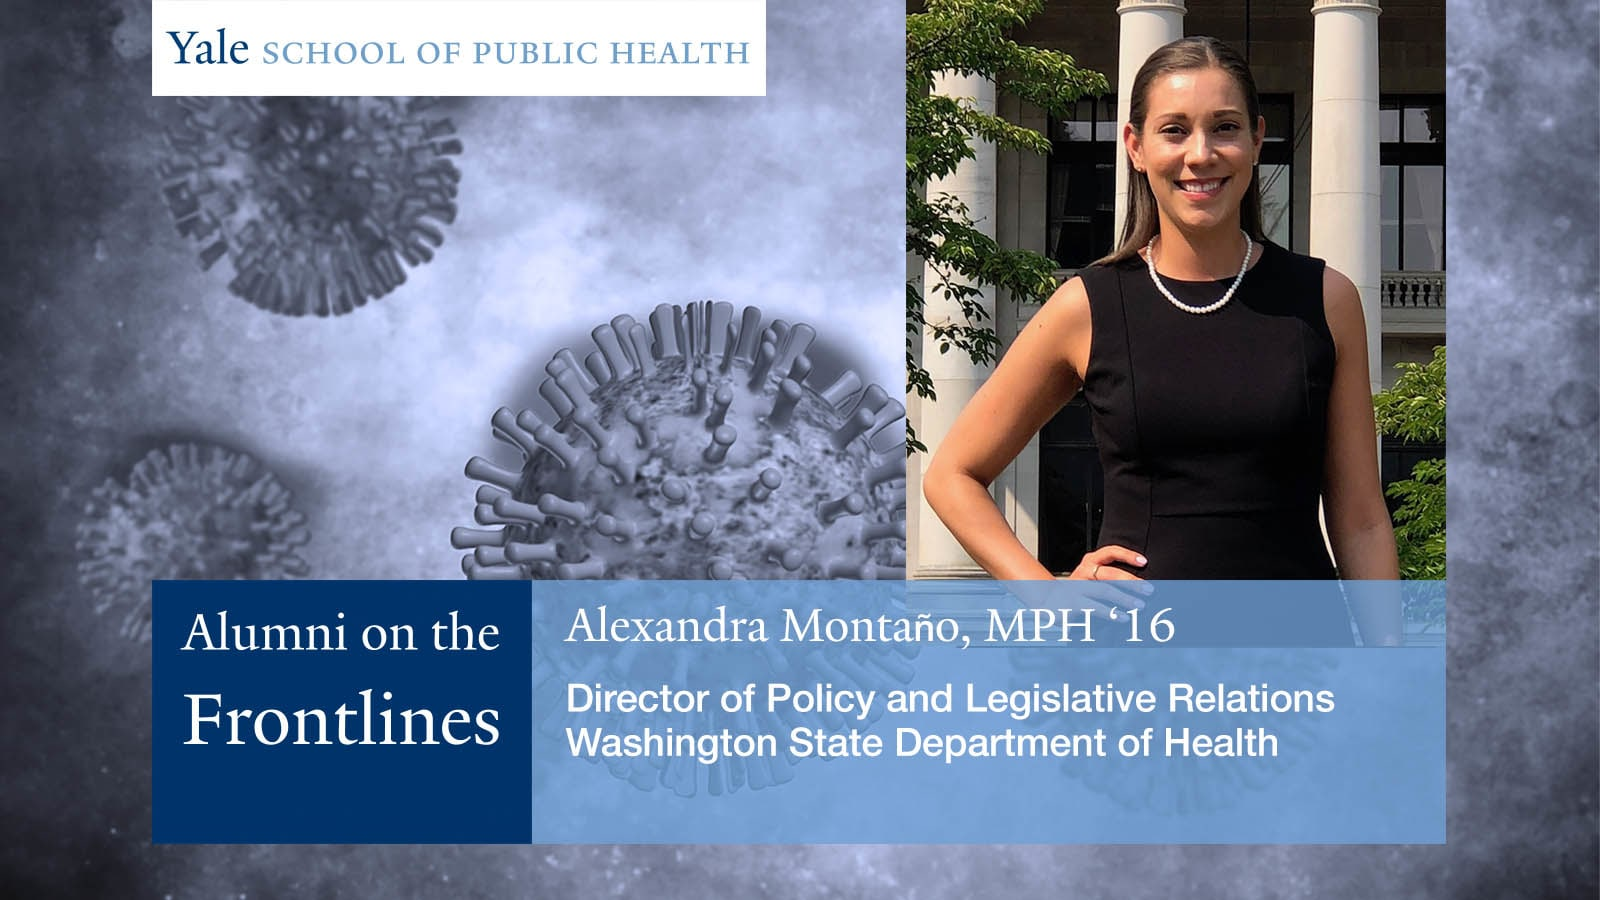 Alexandra Montaño, MPH '16